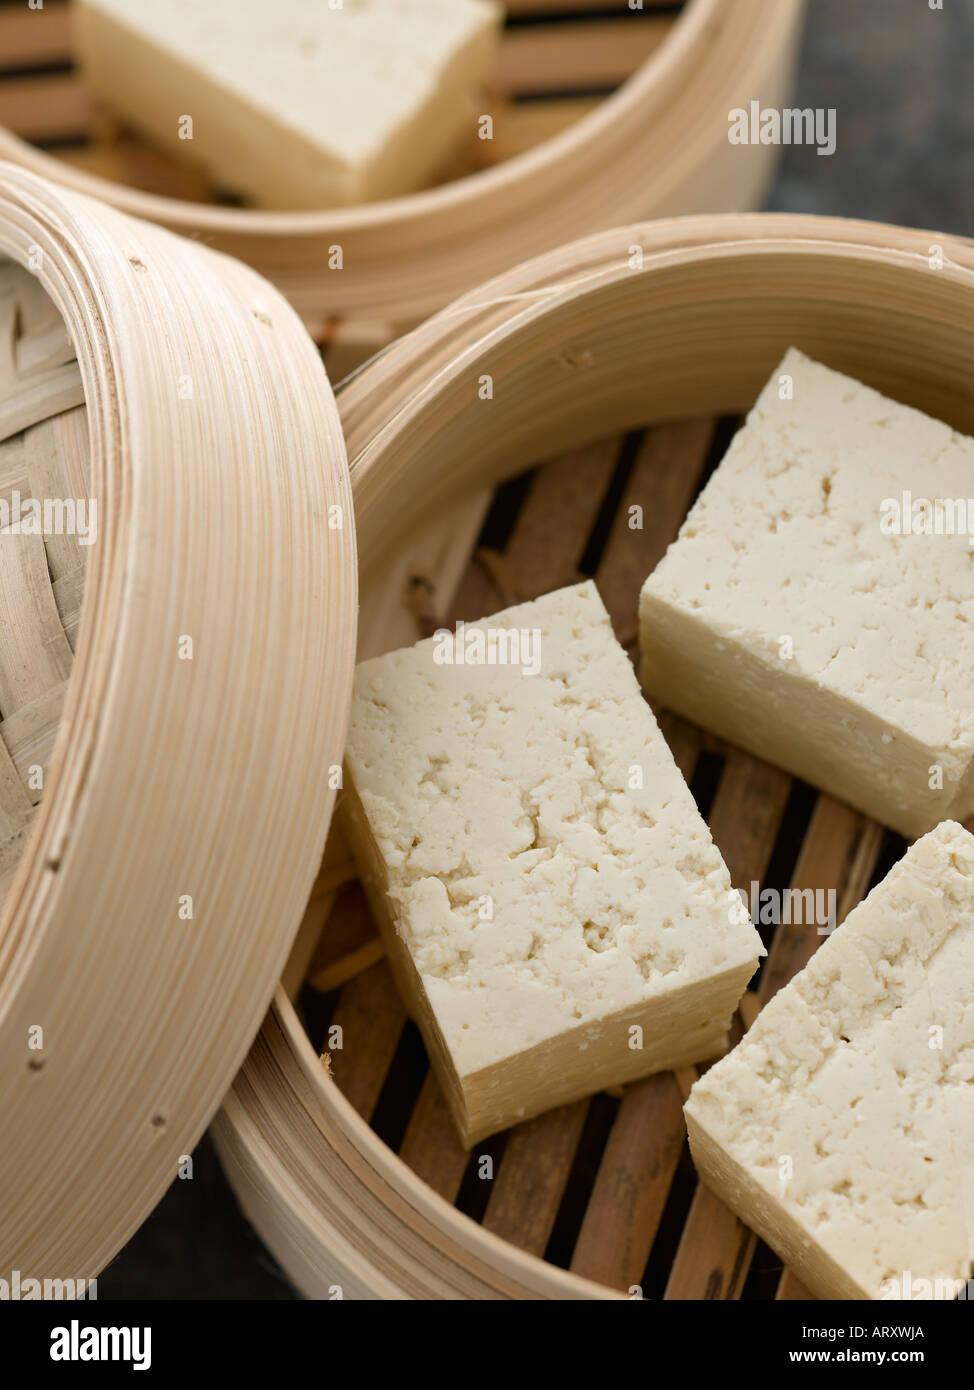 Tofu in bamboo steamer - Stock Image